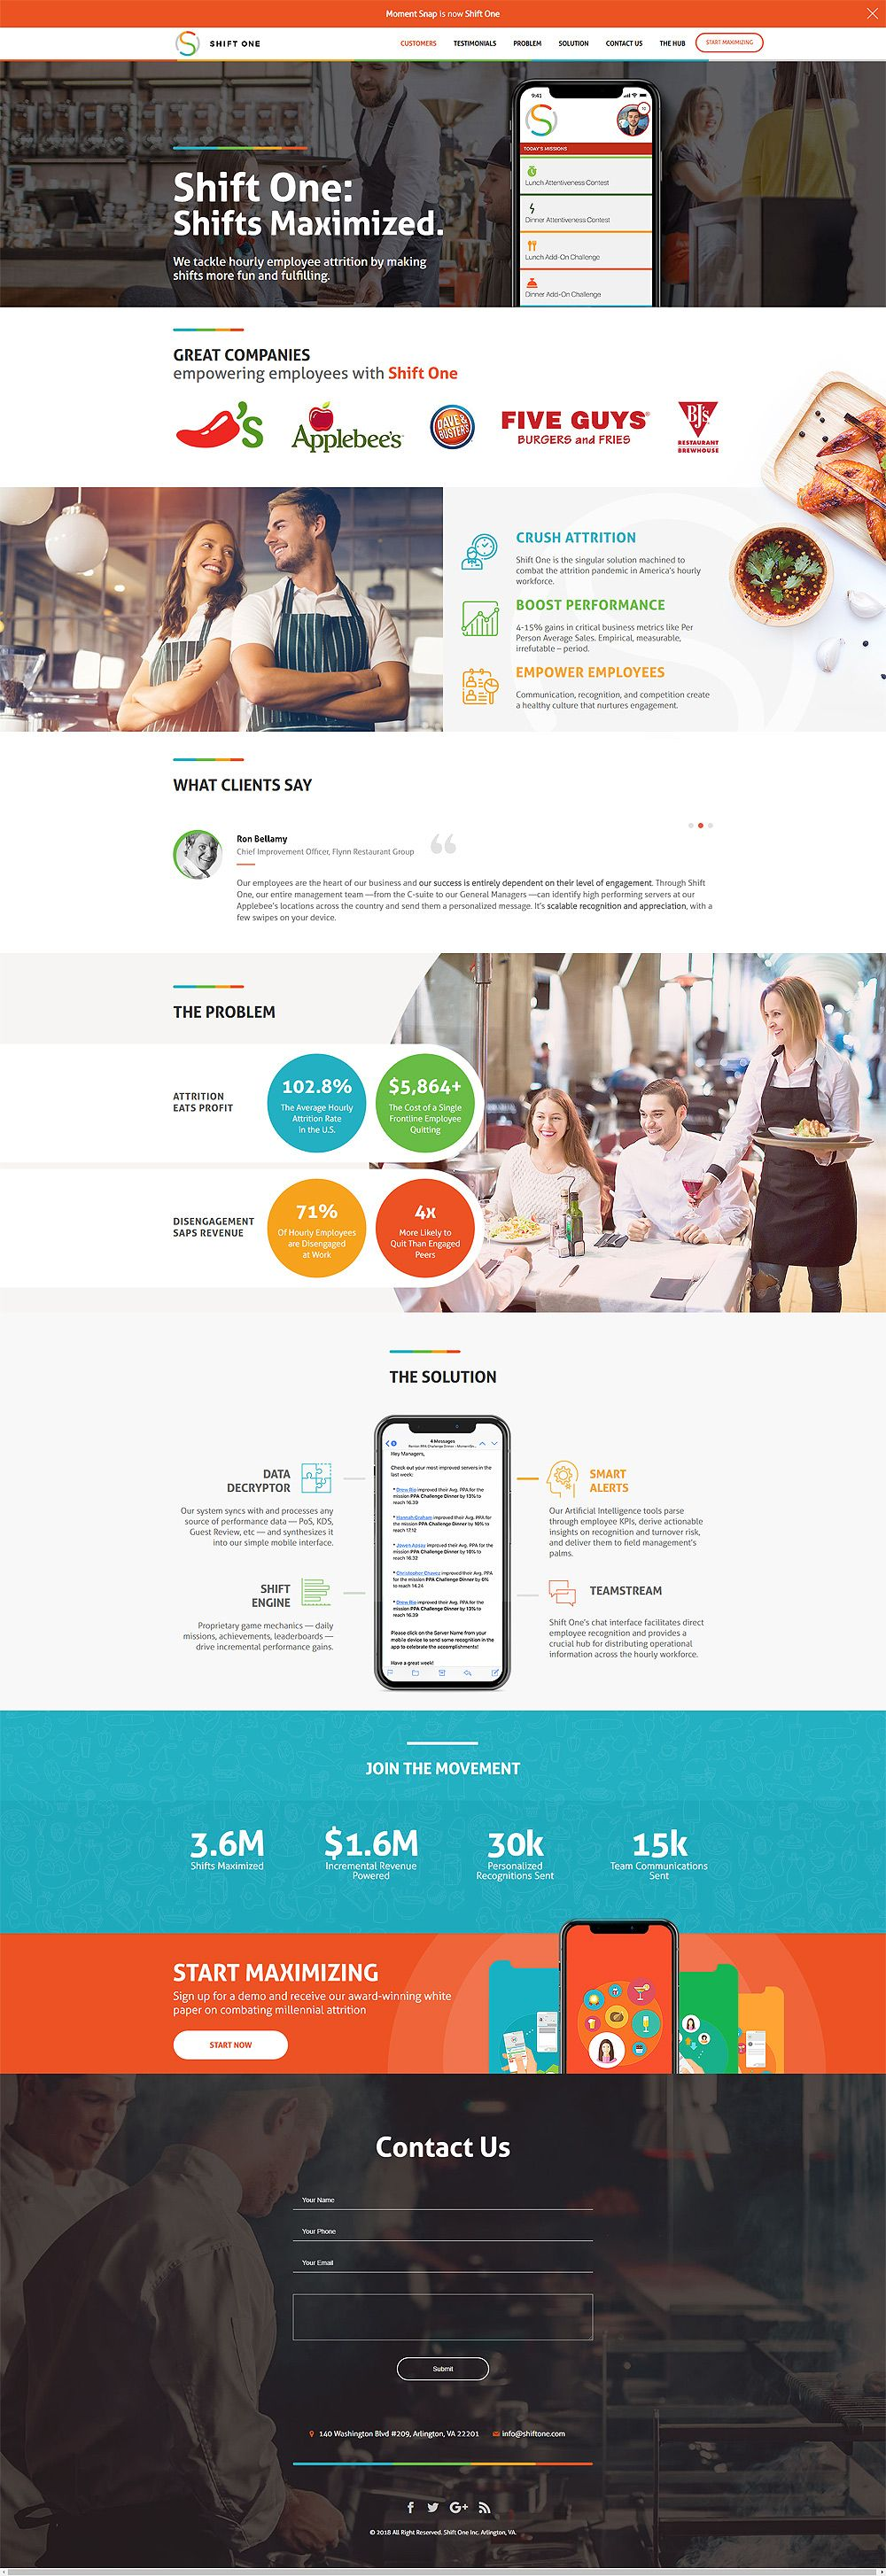 Arlington Website Design For Shiftone Employee Shift Management Solution Website Design Enterprise Application Solutions